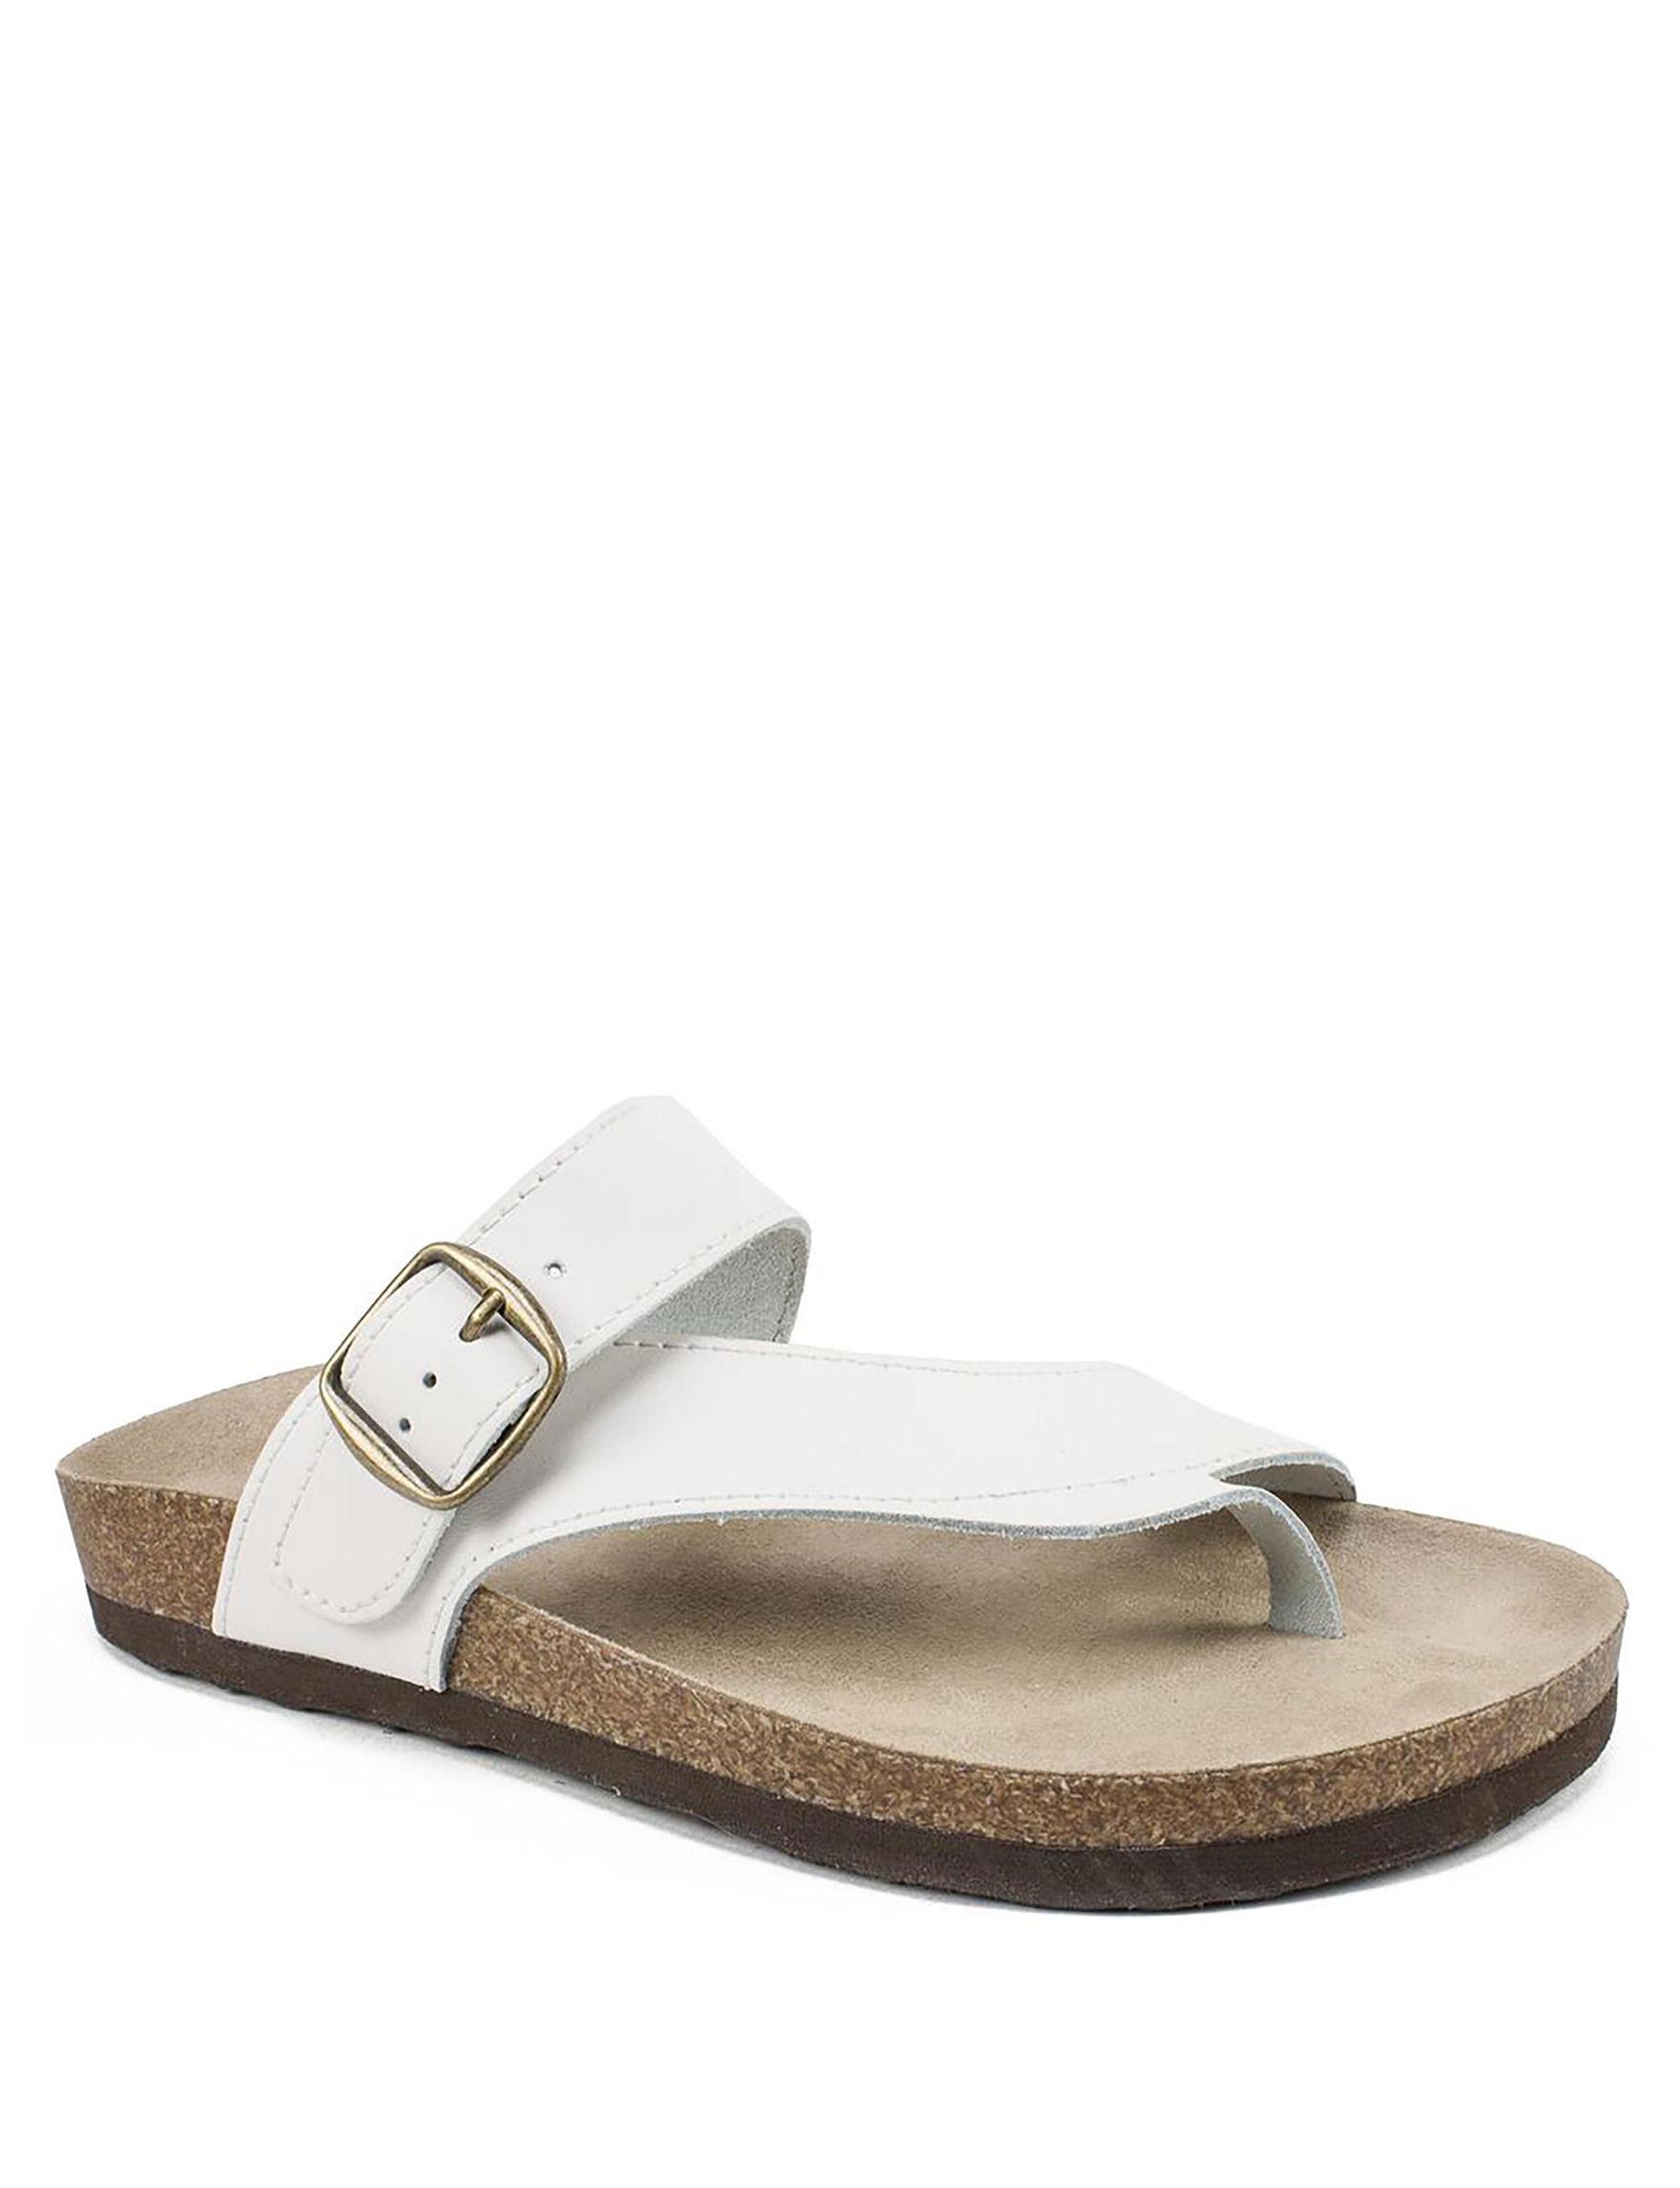 White Mountain White Flat Sandals Comfort